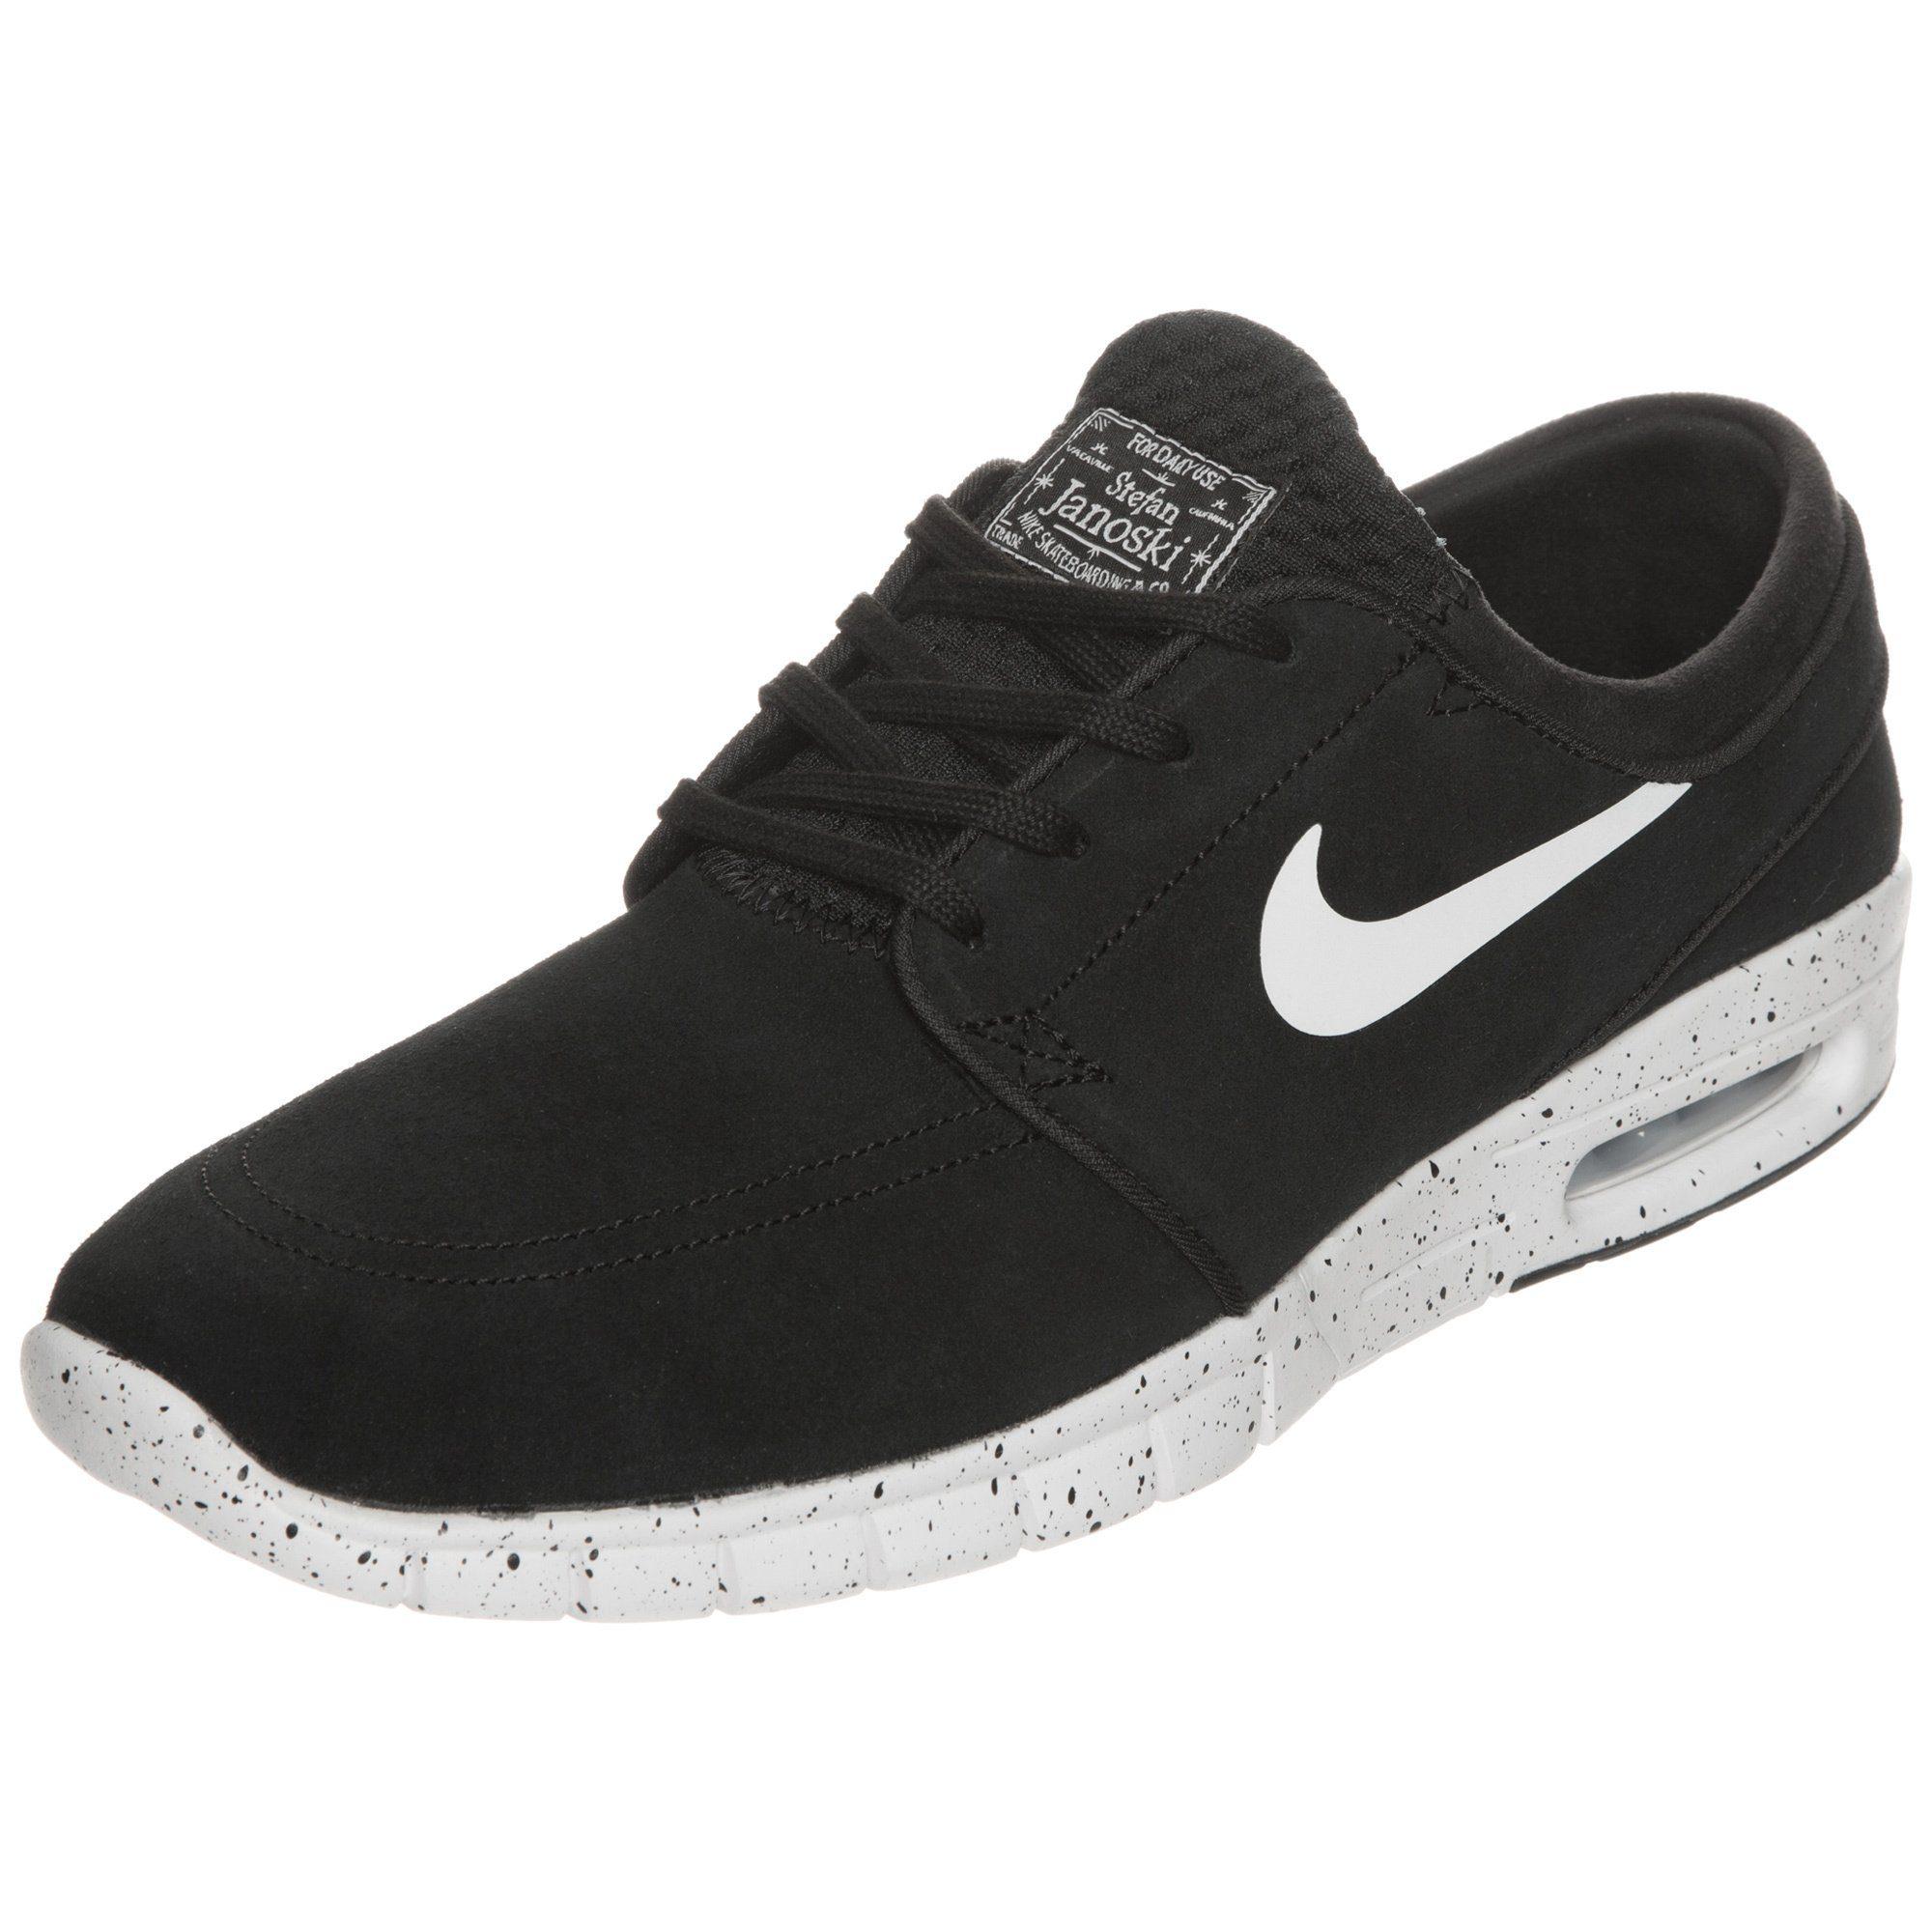 Nike SB Stefan Janoski Max Leather Sneaker  schwarz-weiß